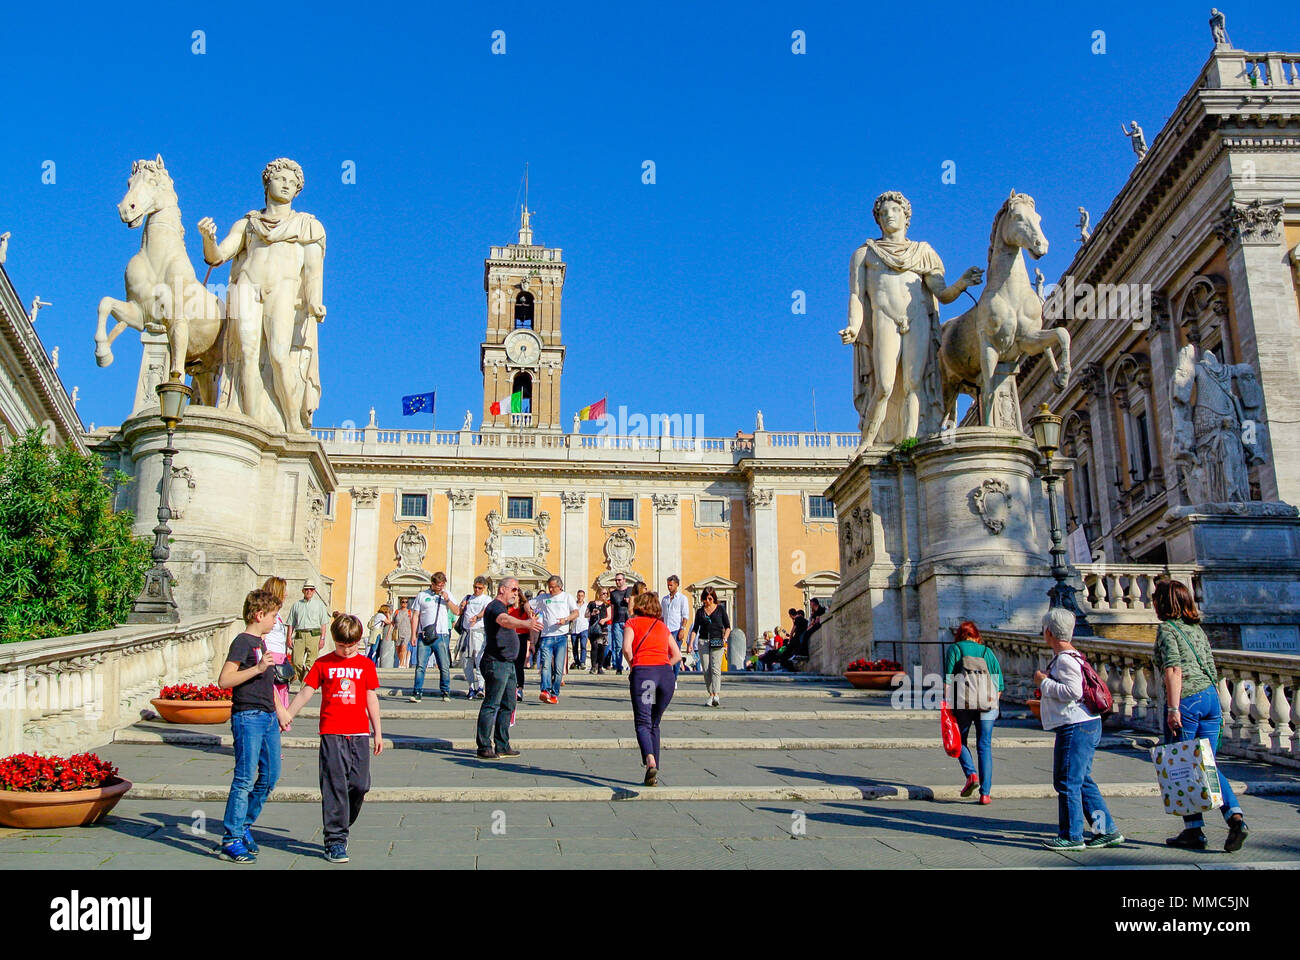 palazzo senatorio, rome, italy Stock Photo